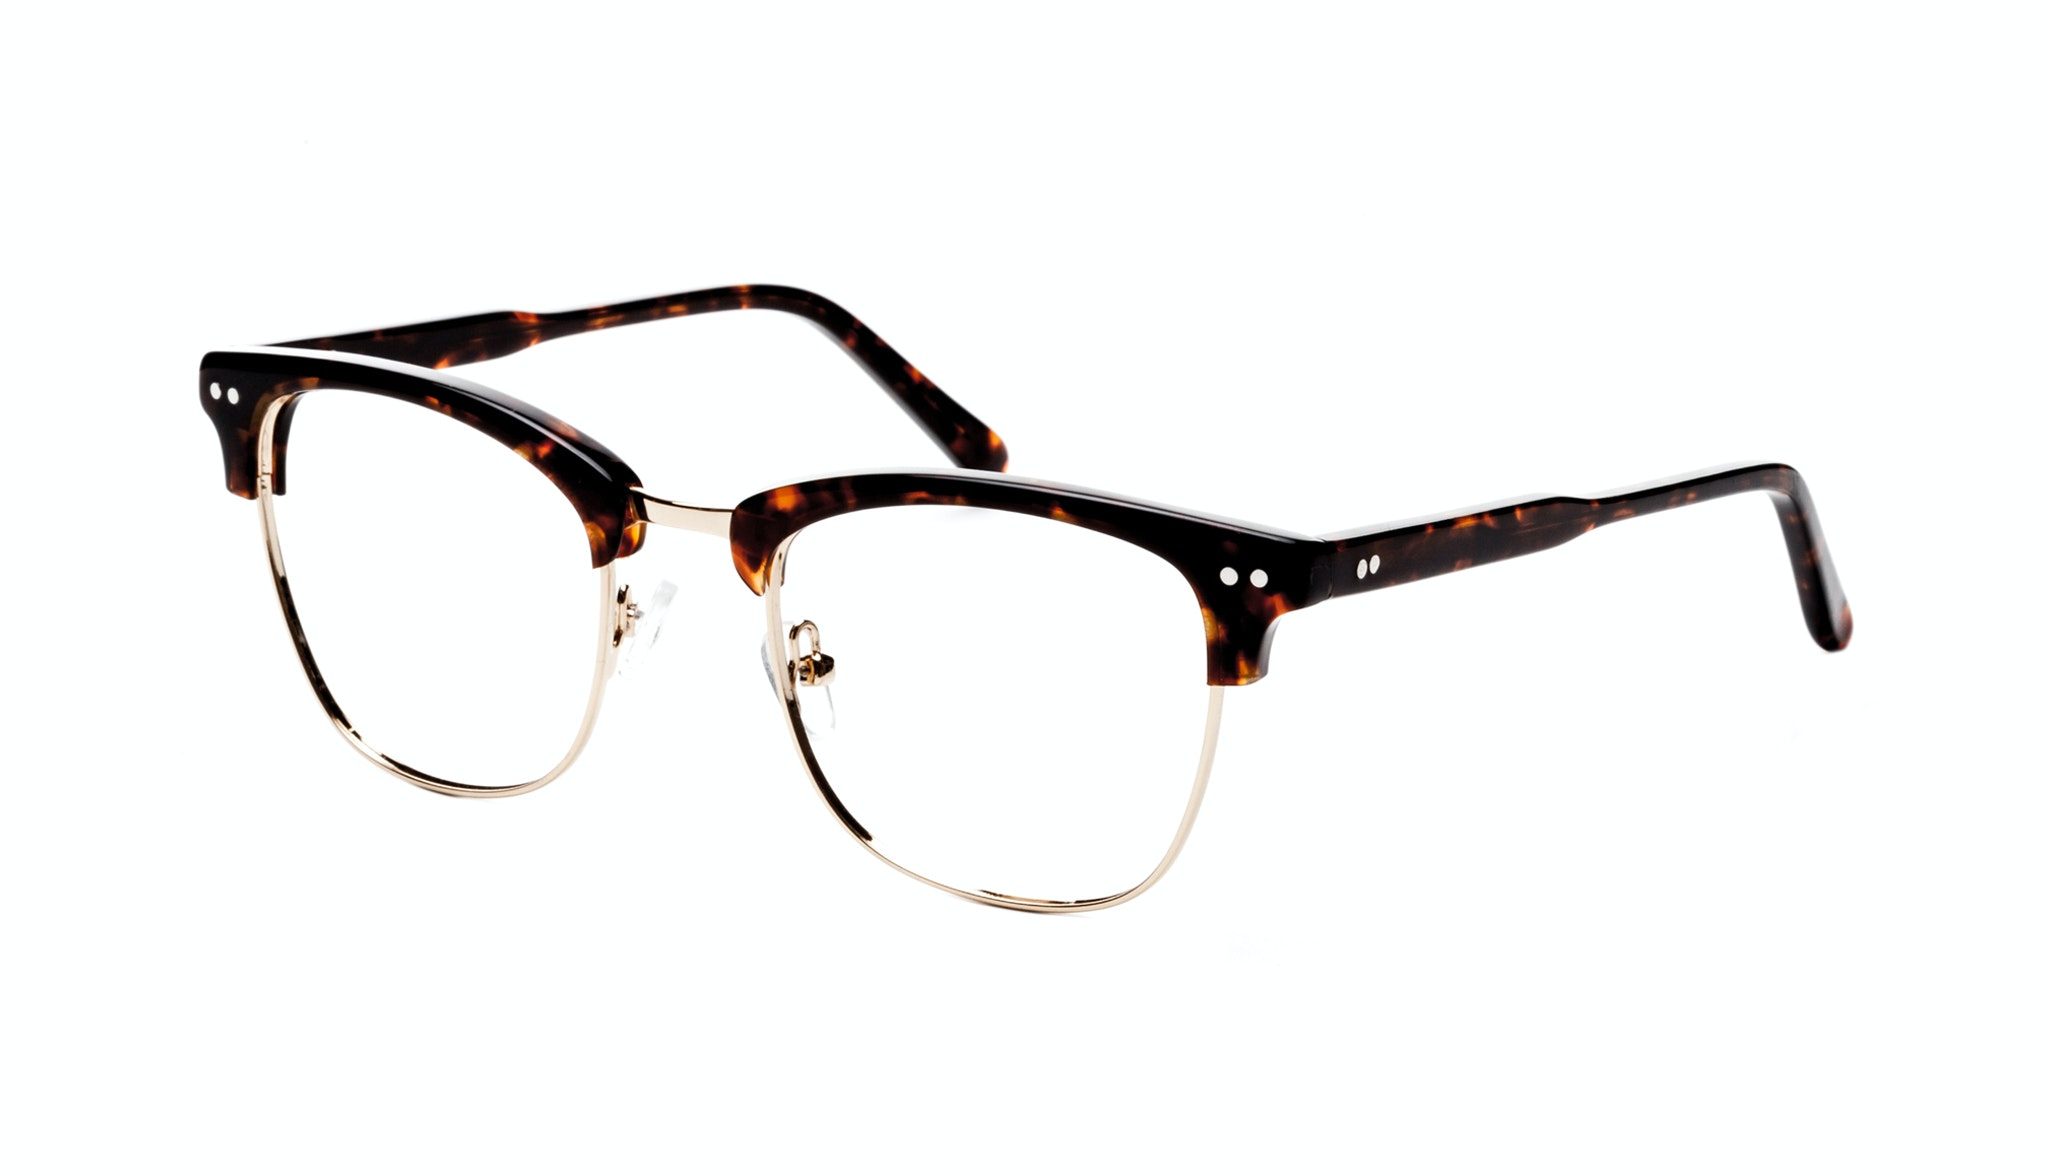 Affordable Fashion Glasses Square Eyeglasses Men Lift Gold Sepia Tilt